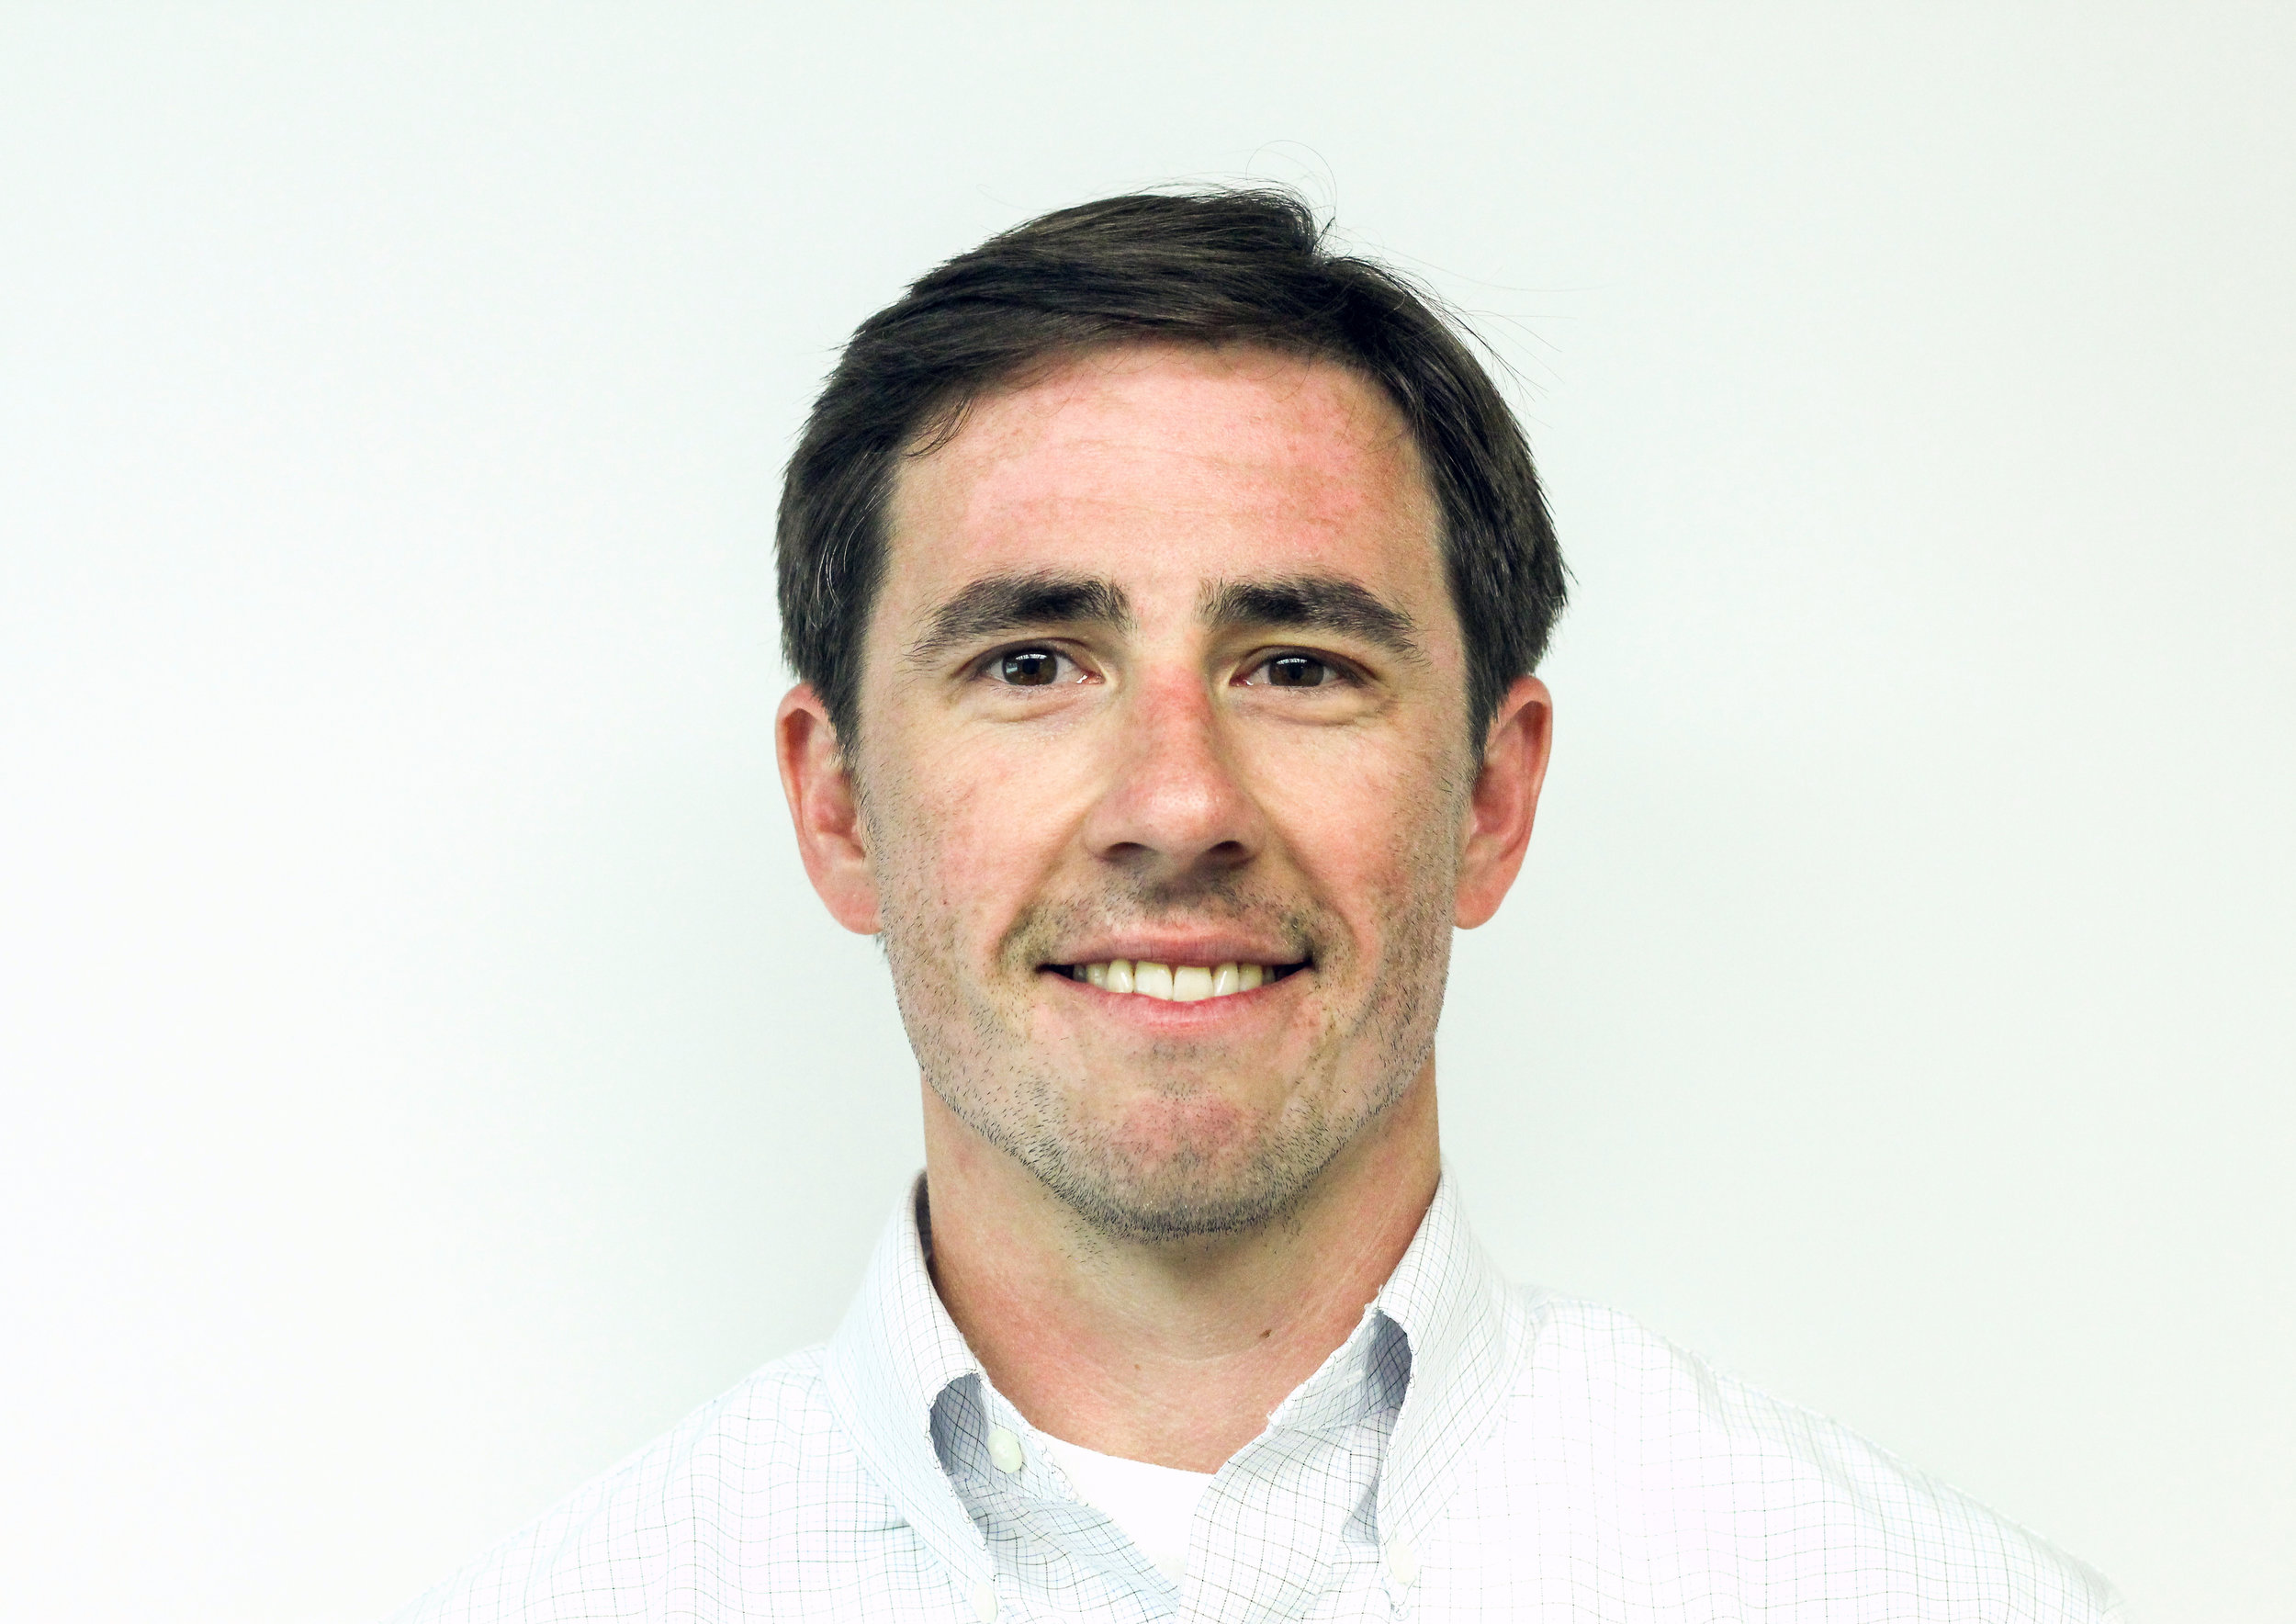 Chuck Henn, Peninsula Alternative Health Chief Operating Officer